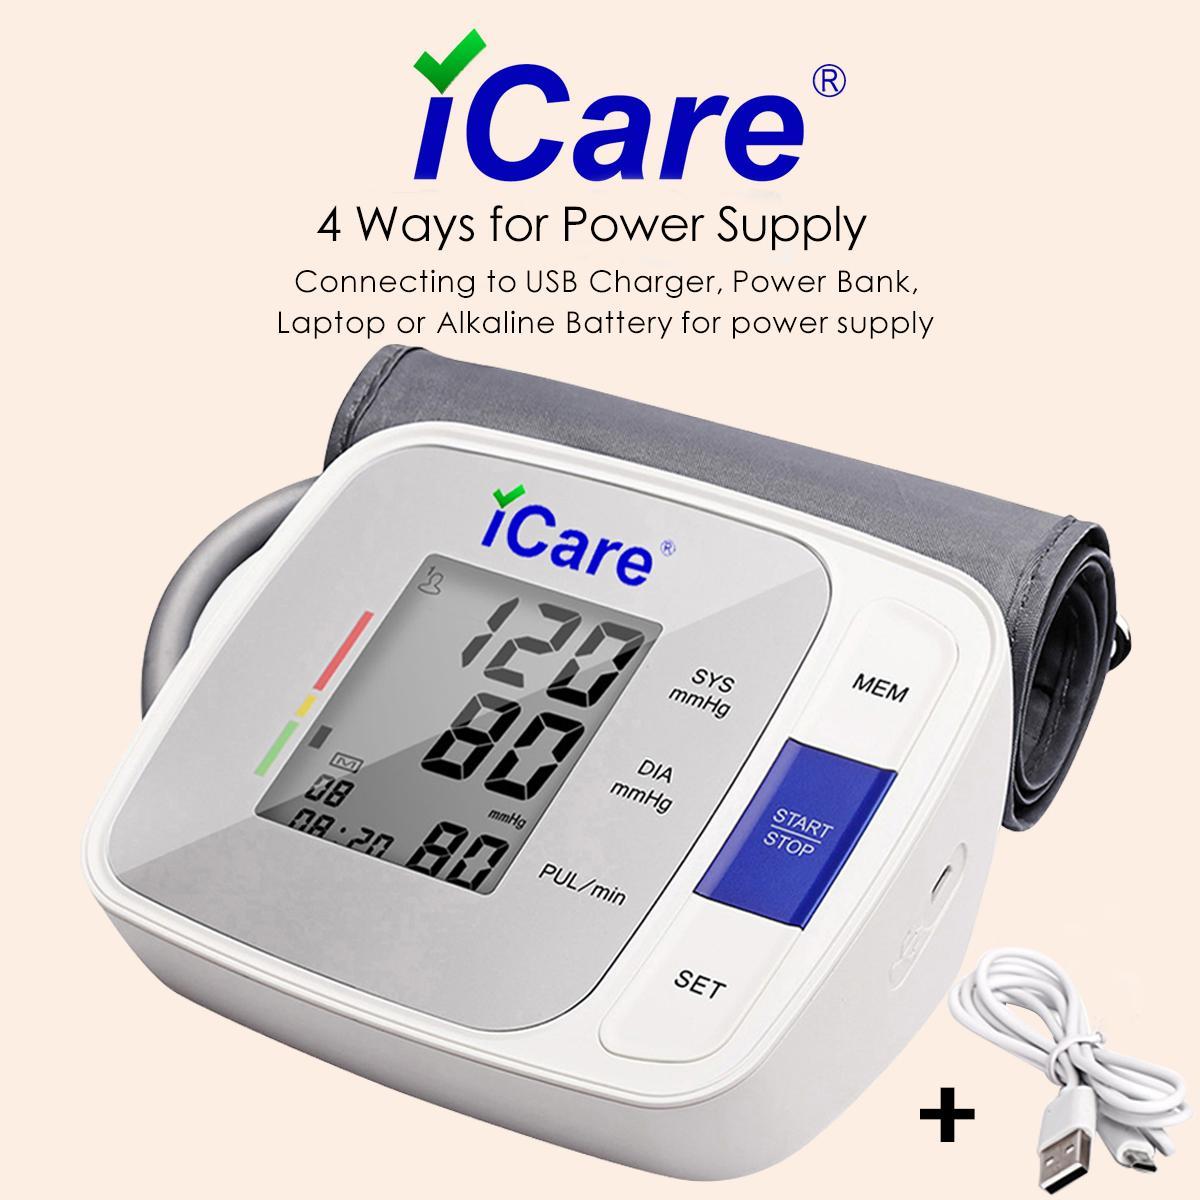 Household Health Monitors Beautiful Doctor Medical Equipment Cardiology Blood Pressure Monitor Meter Tonometer Cuff Stethoscope Kit Travel Sphygmomanometer